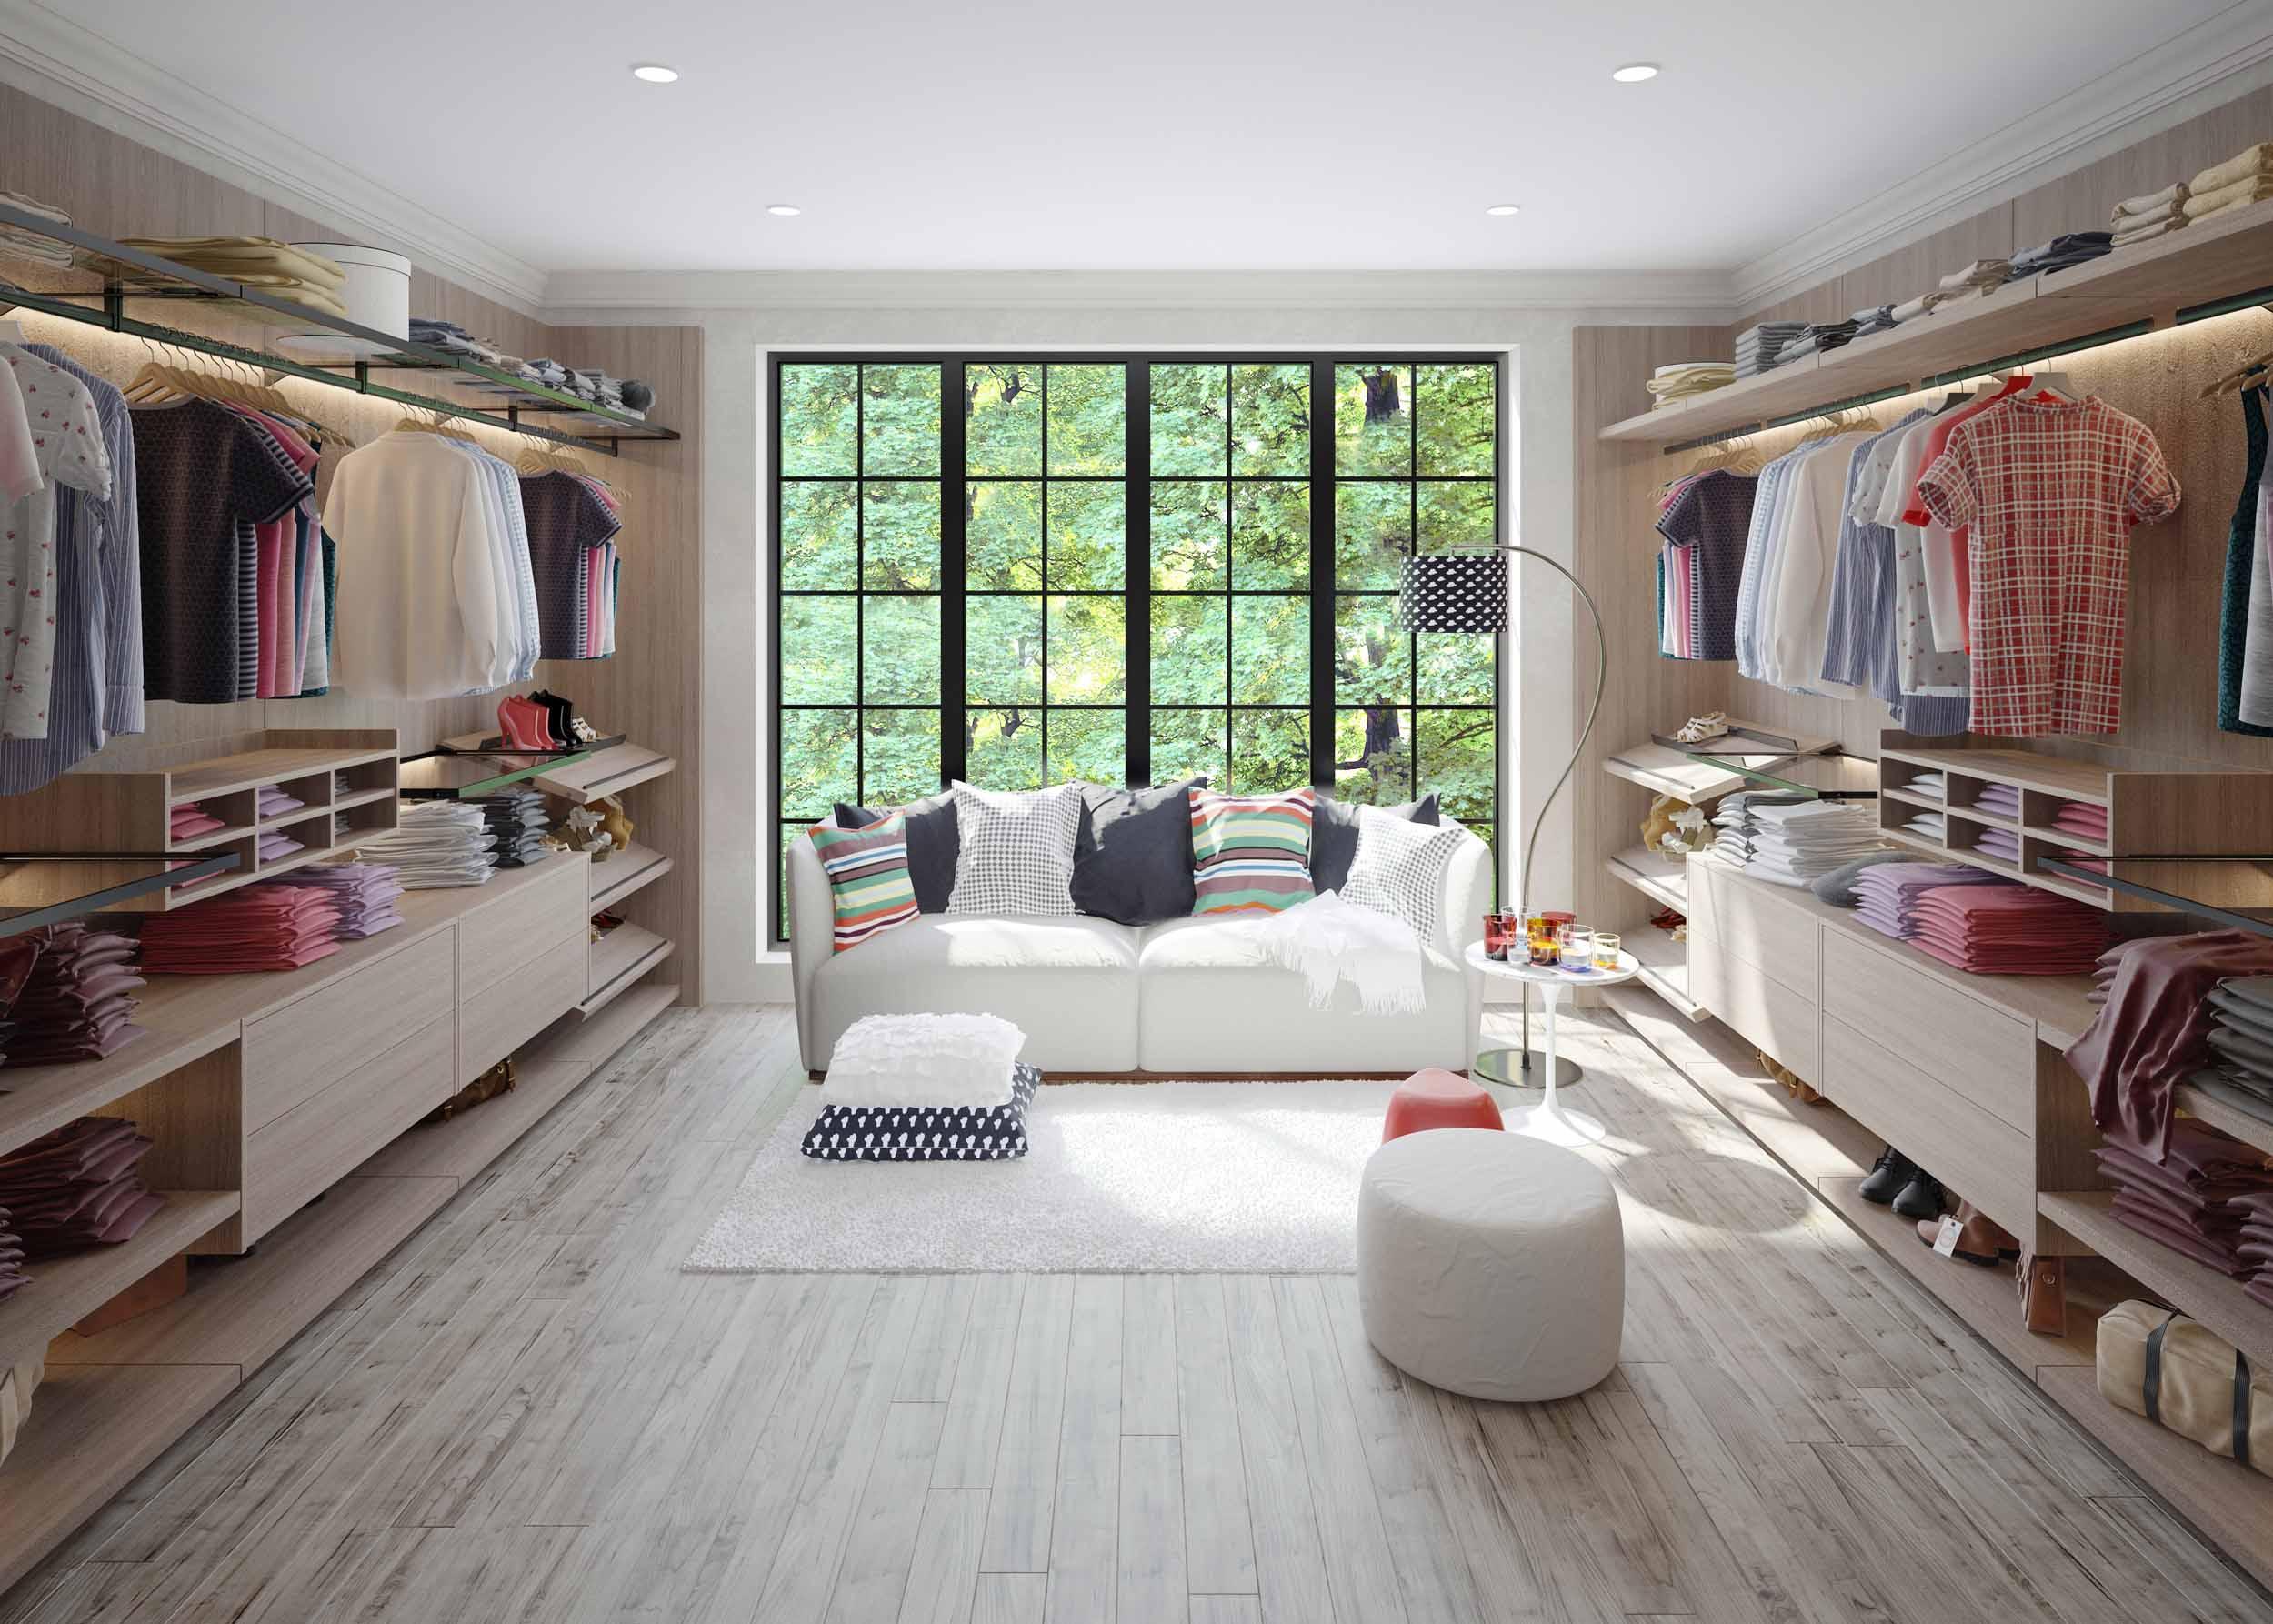 Linear Walkin fitted wardrobe with vertiko profile woodgrain finish